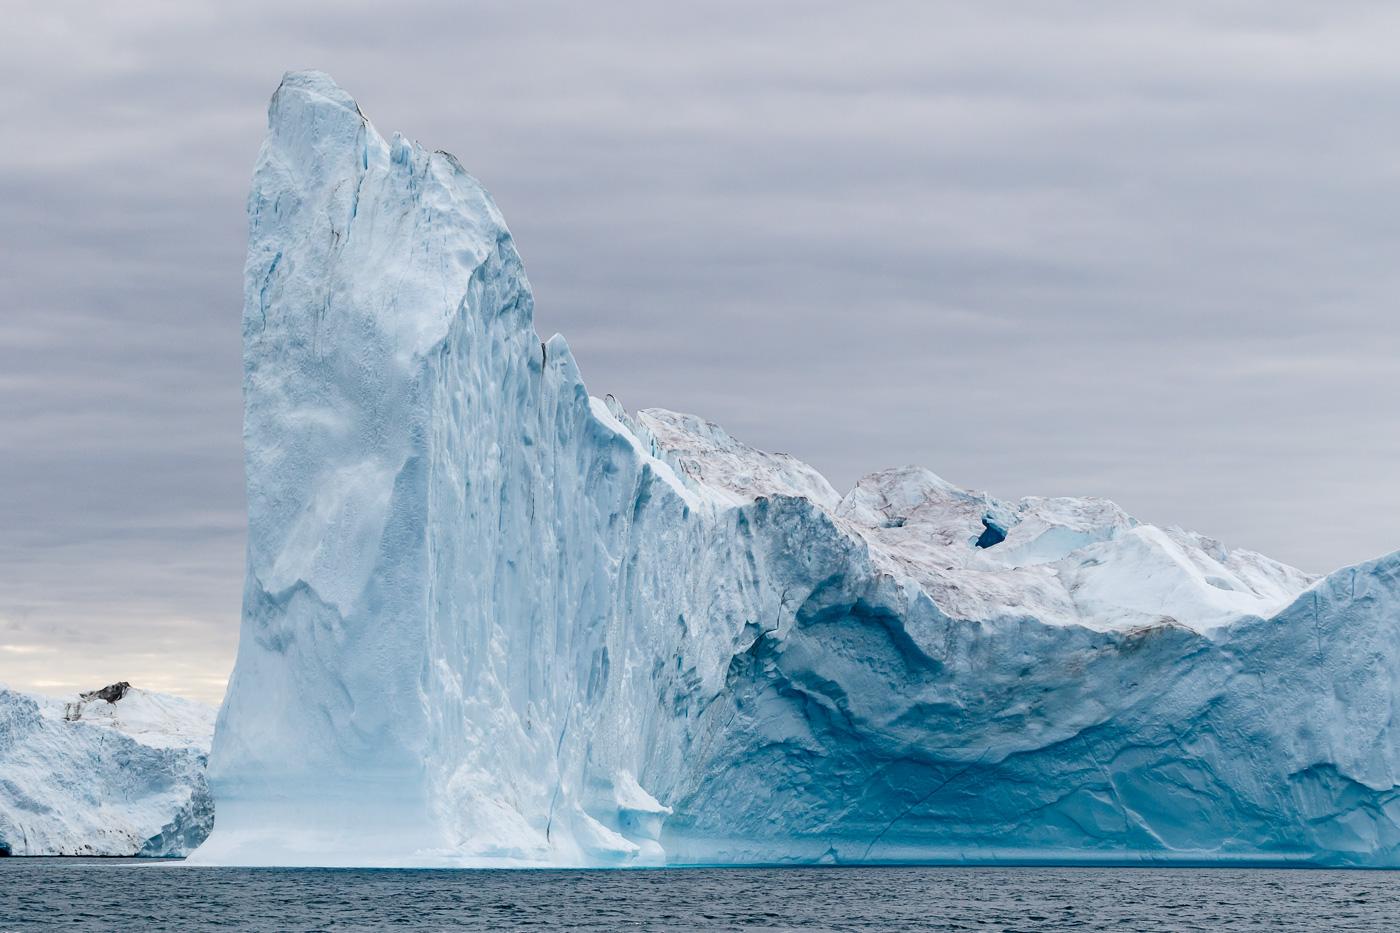 Sculpture in Ice